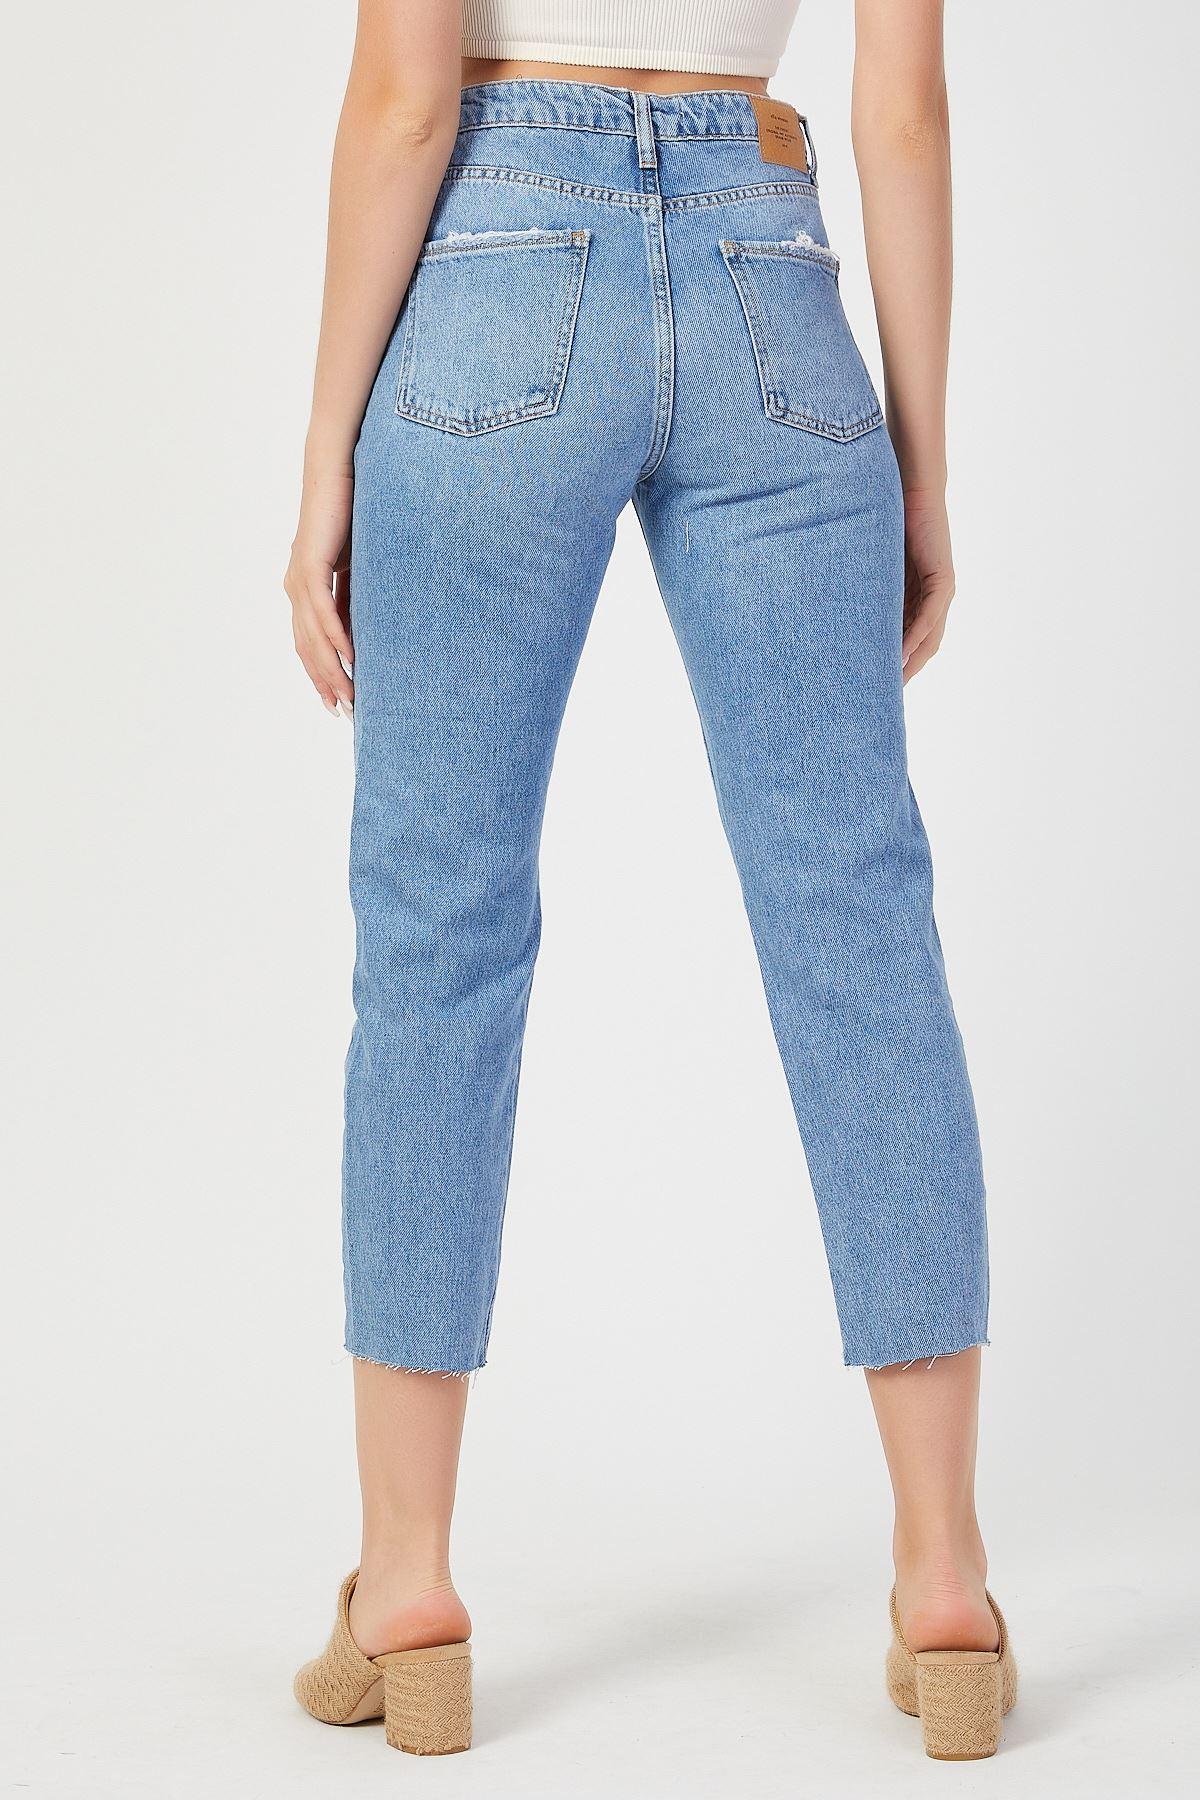 Paça Yıpratmalı Yüksek Bel Mom Jeans Kot Pantolon